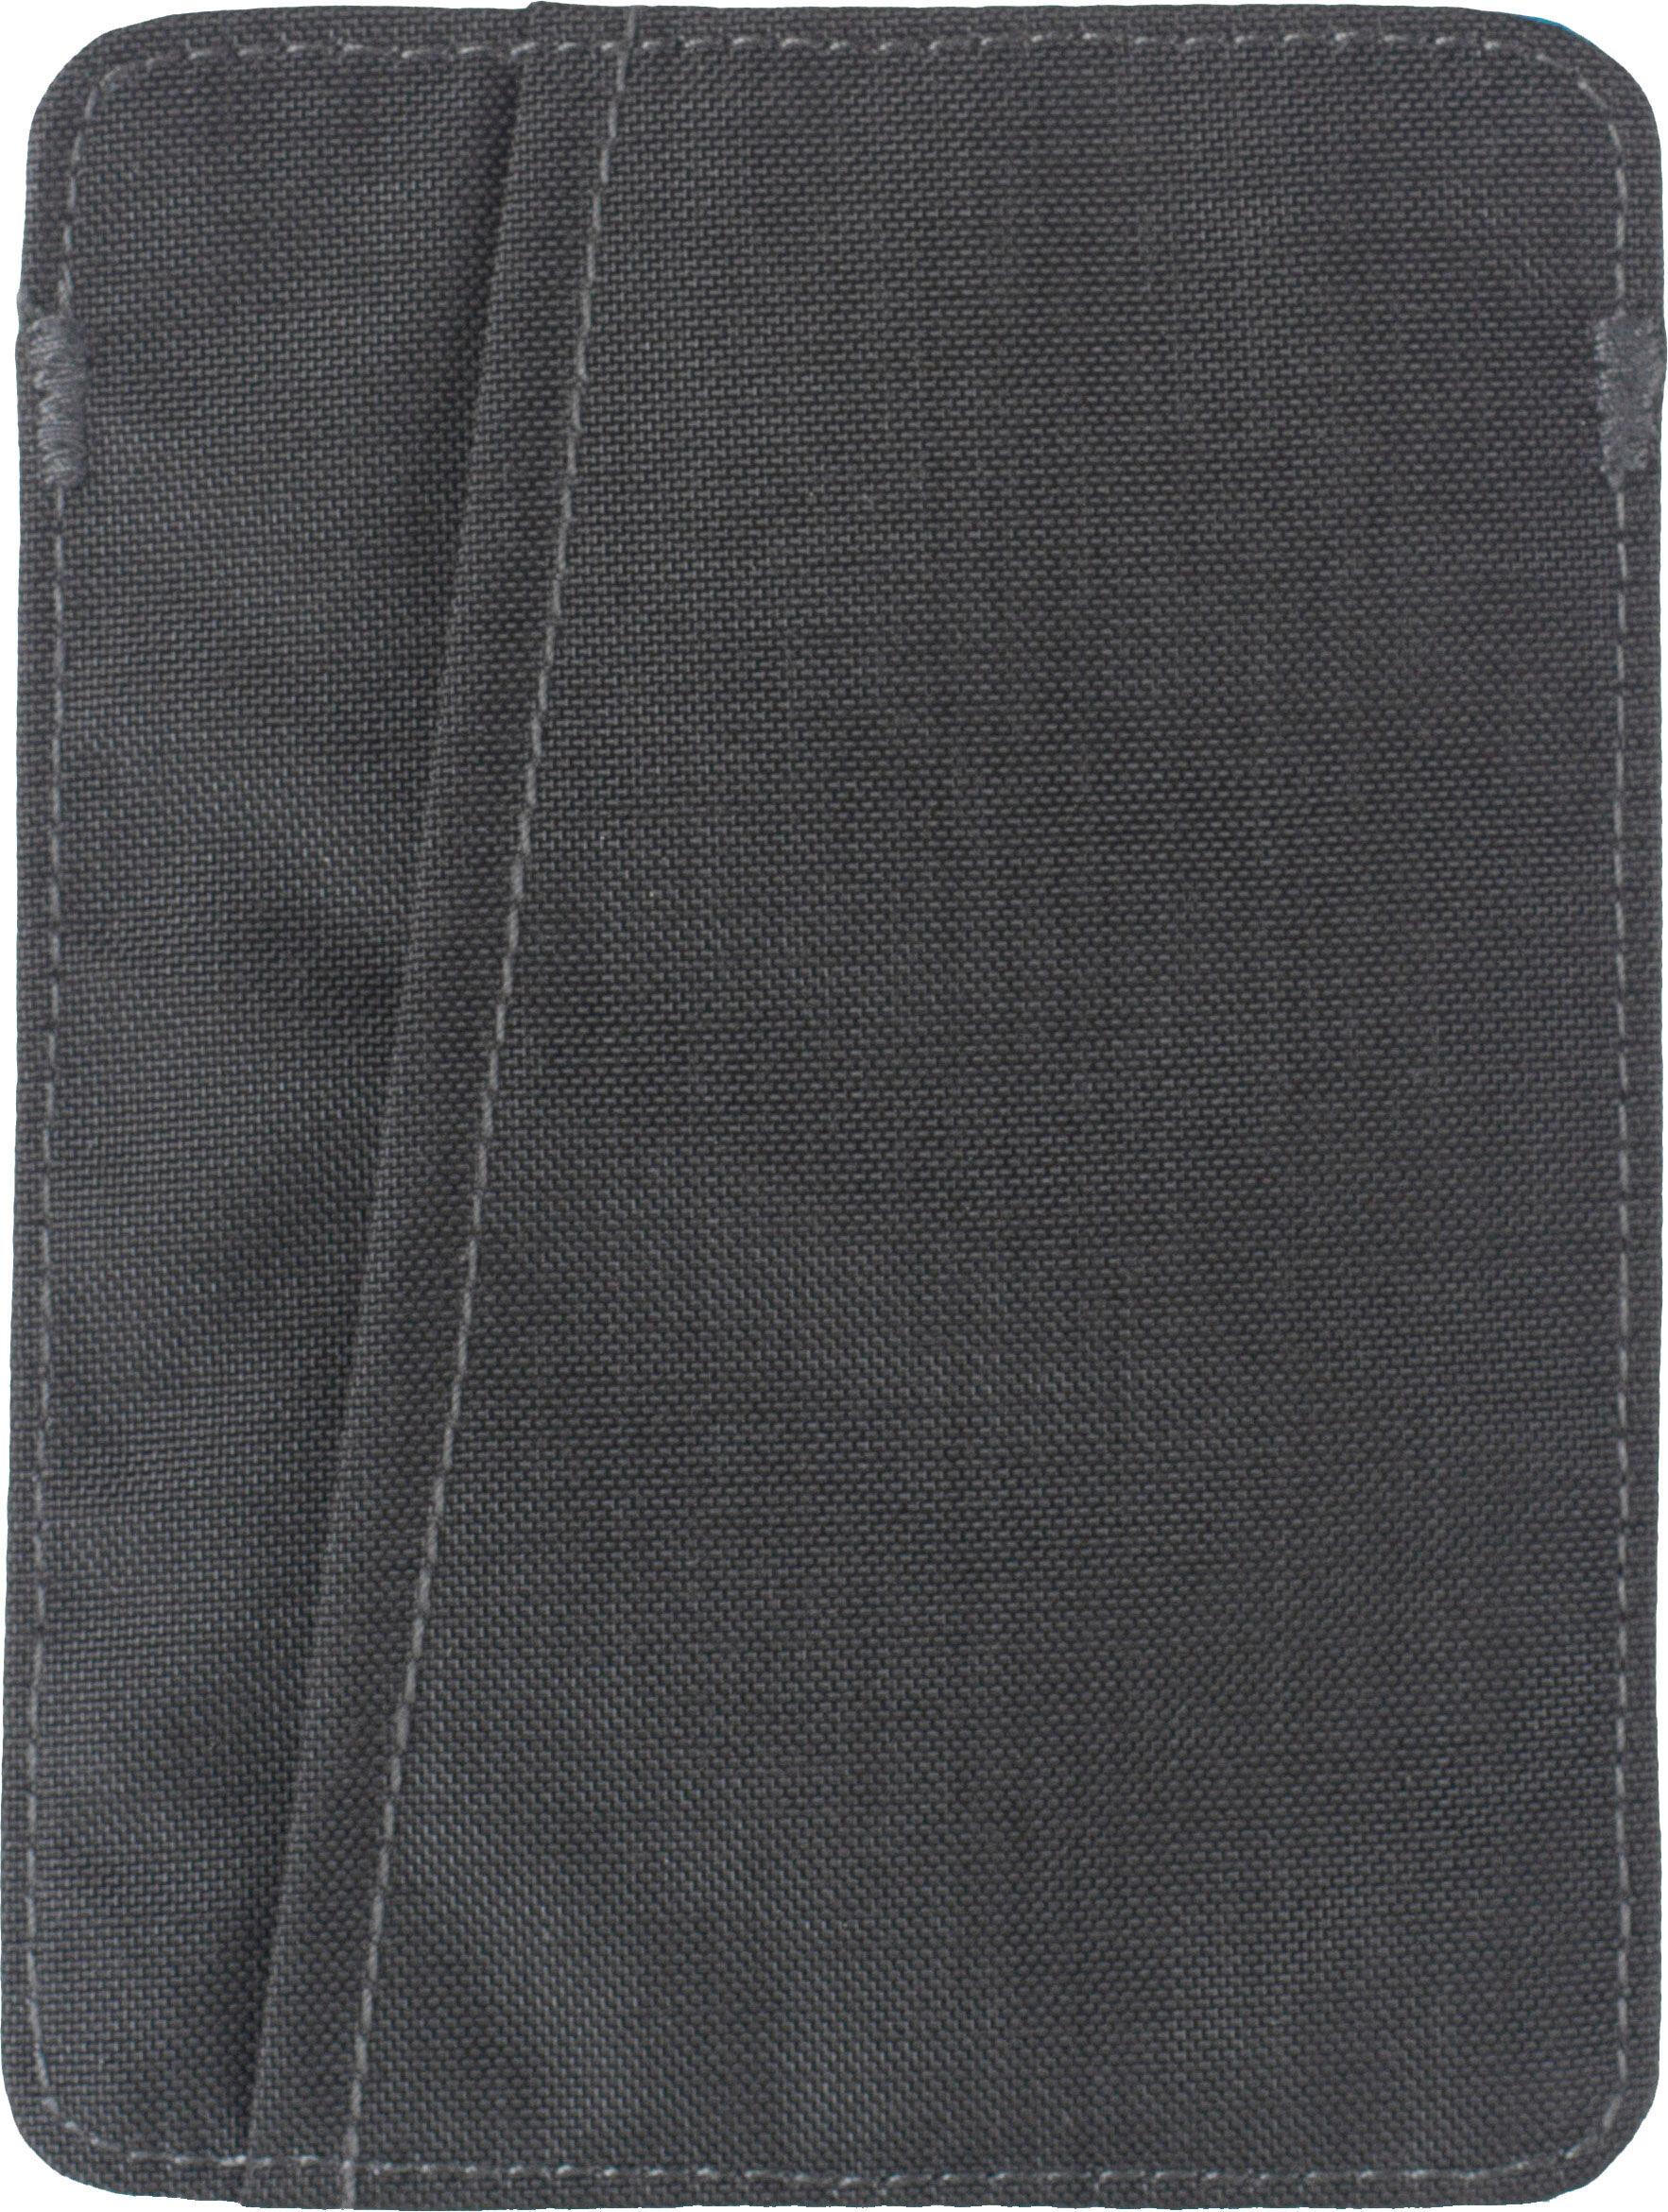 52f5abfcb5ff6 Lifeventure RFID Passport Portfel szary | Sklep Addnature.pl